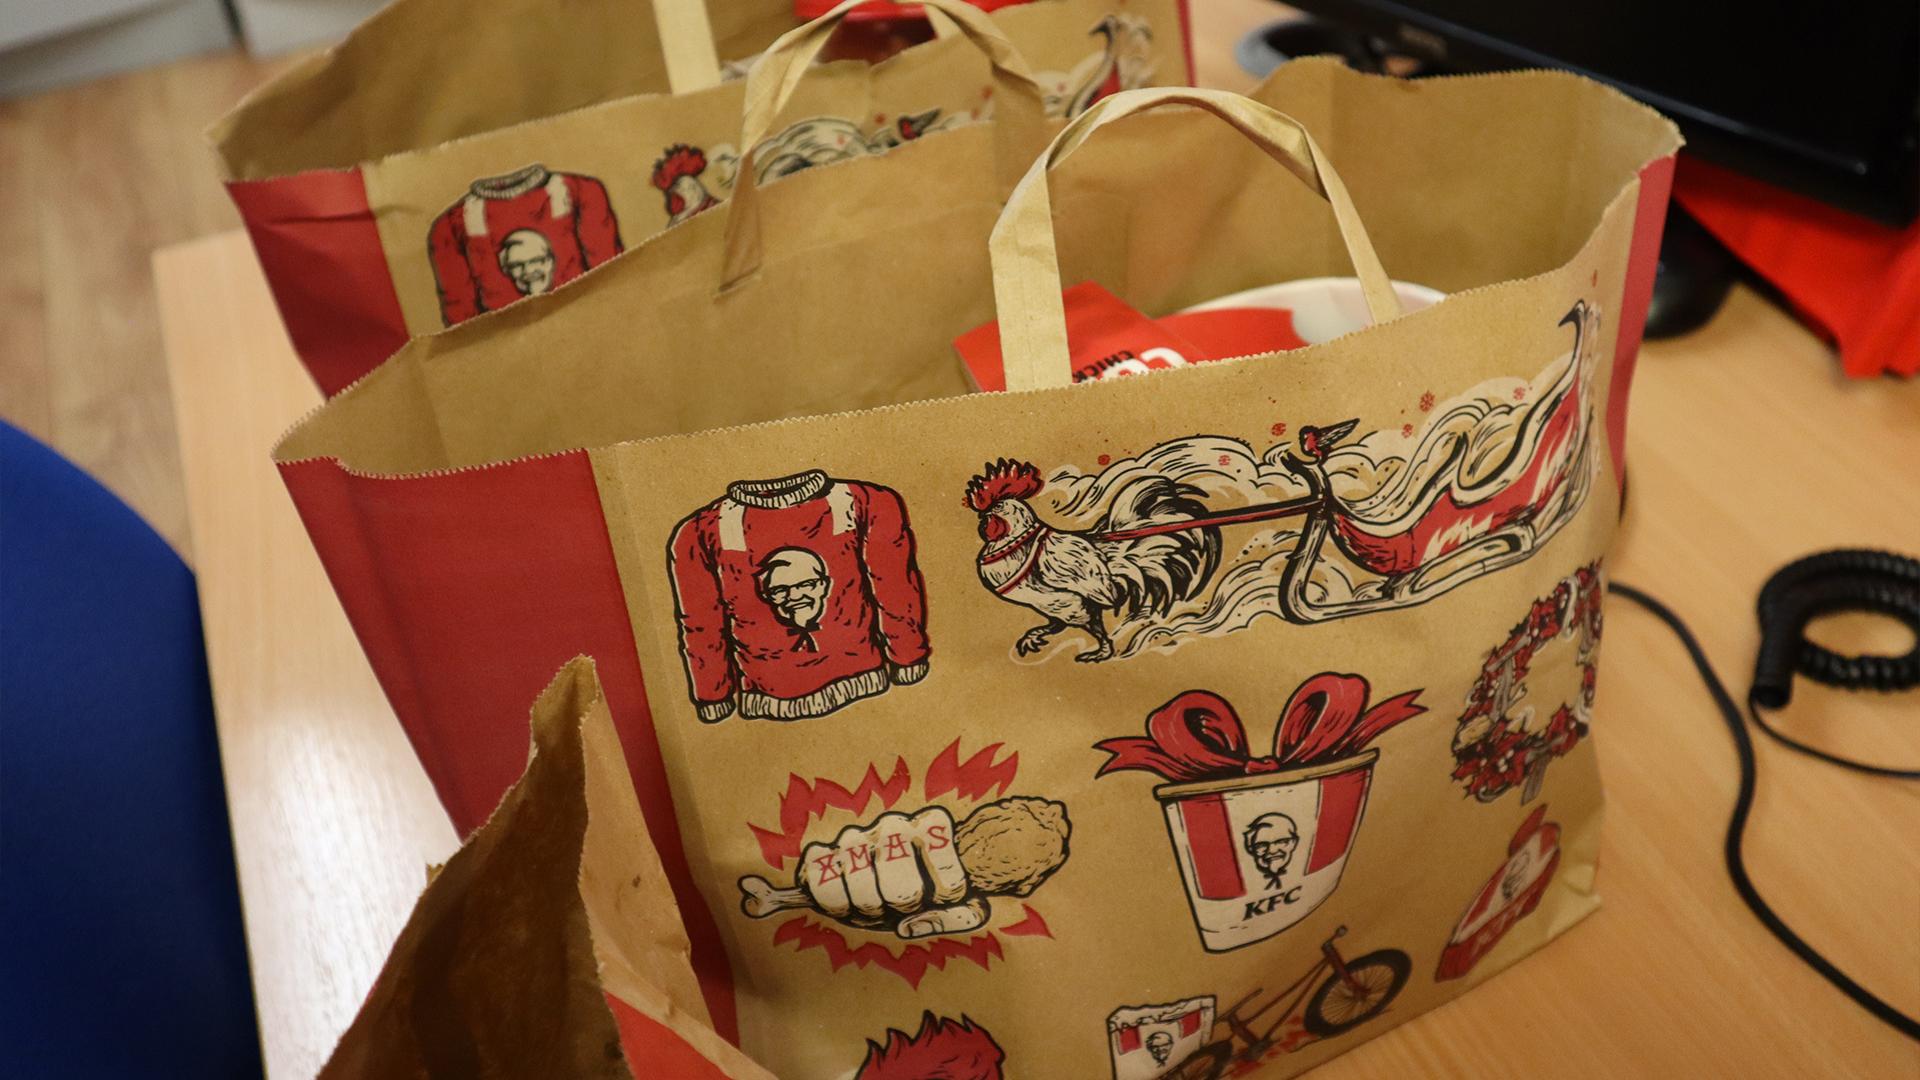 KFC Friday at Hullmoneyman